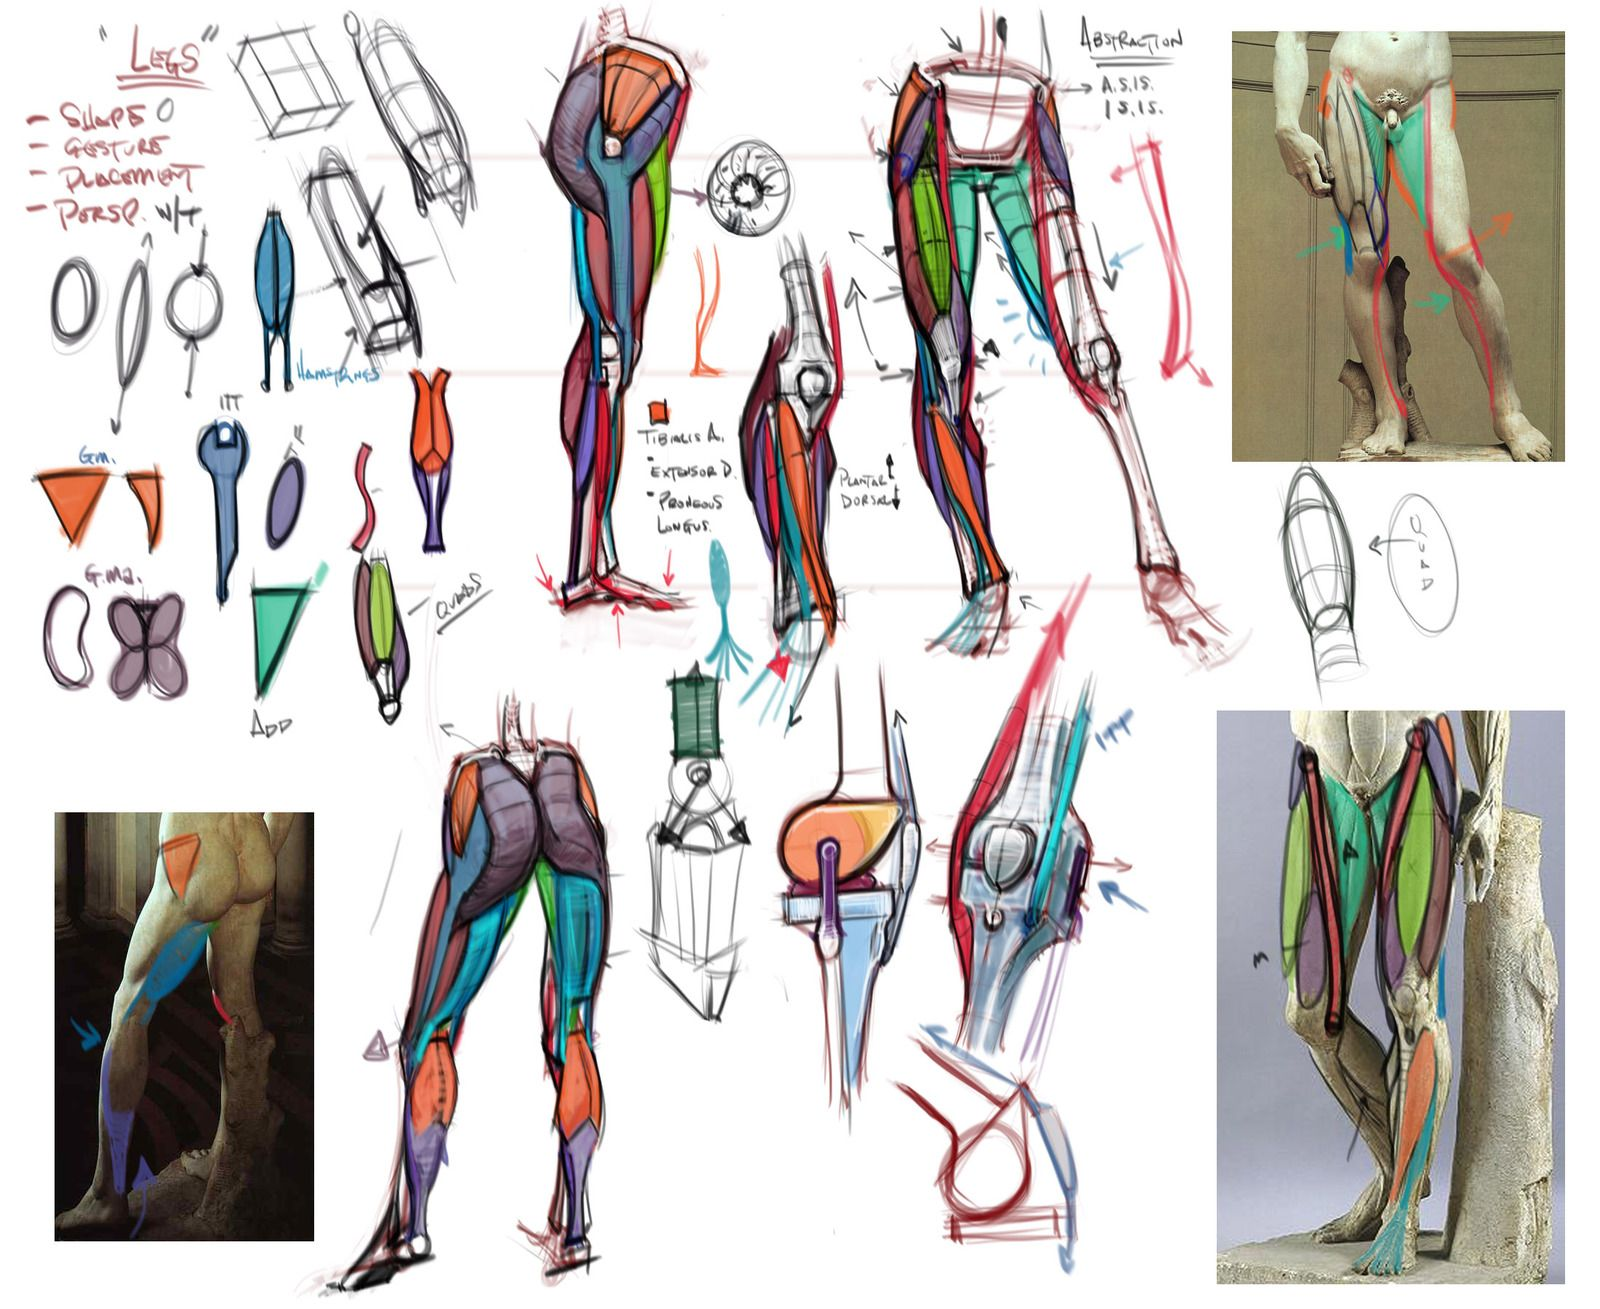 Lecture Notes On The Leg By Mhampton Michael Hampton Cghub Via